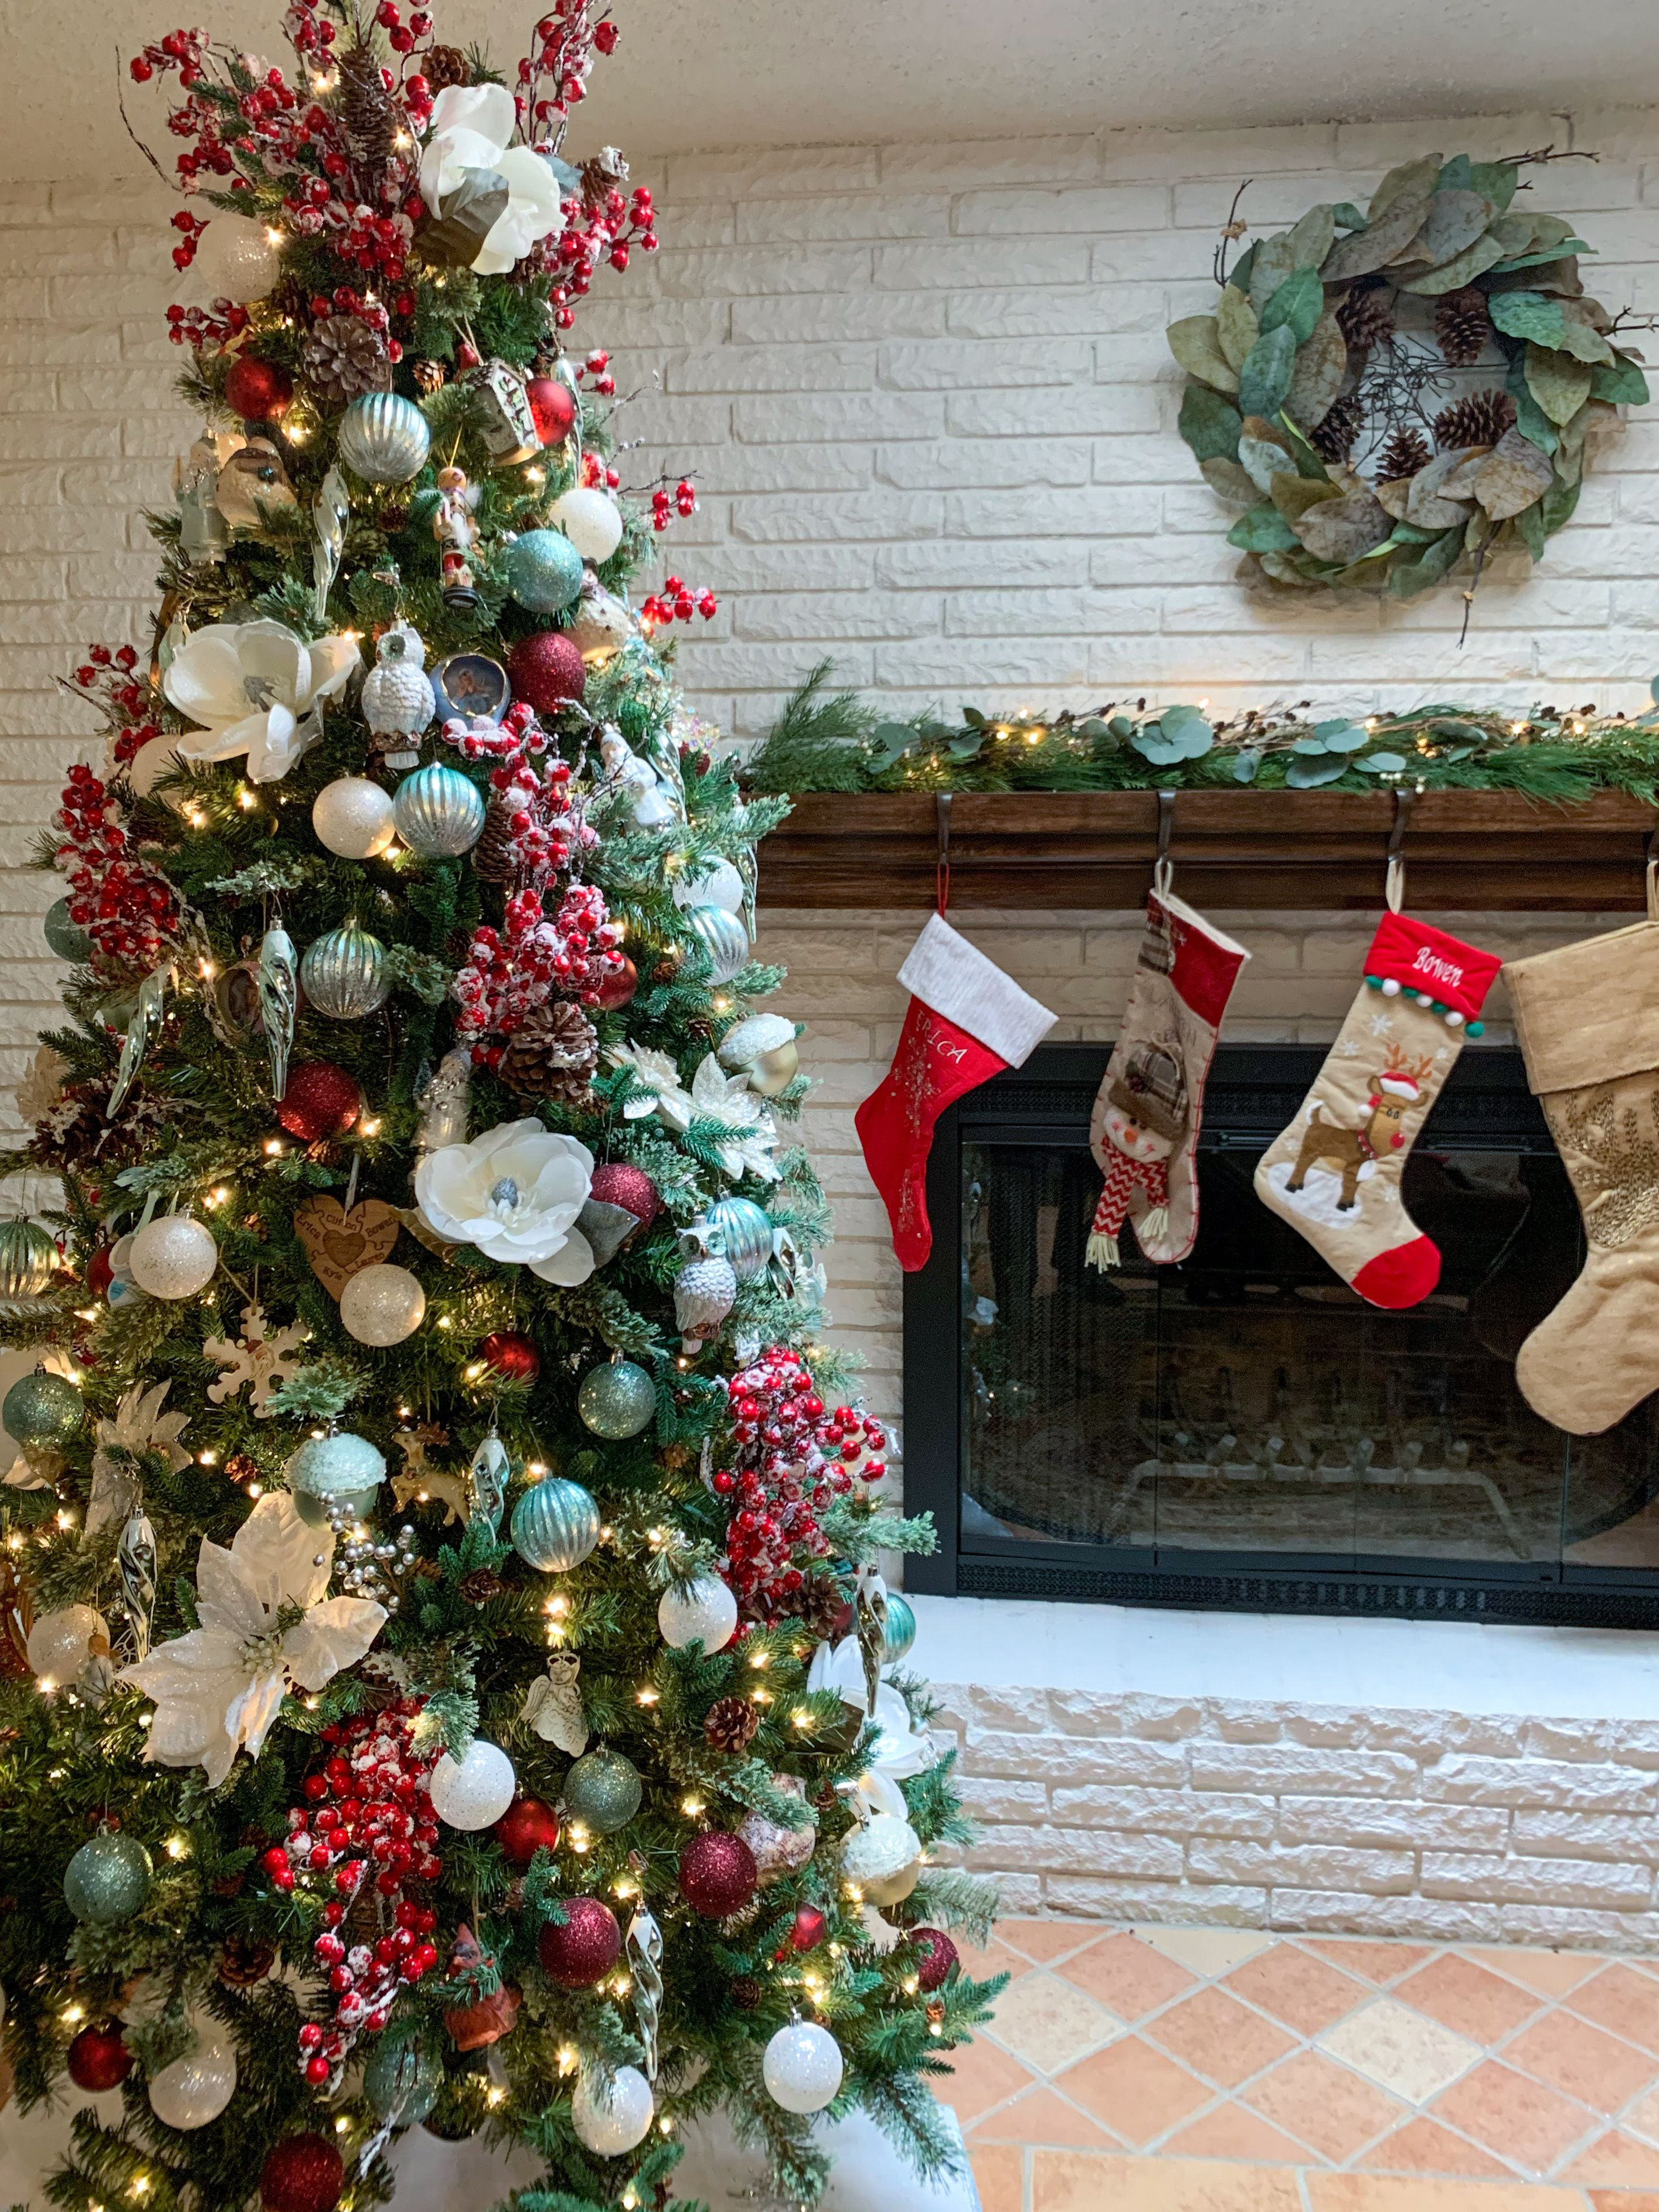 Dreamy Christmas Christmas Tree Decorations Tree Decorations Christmas